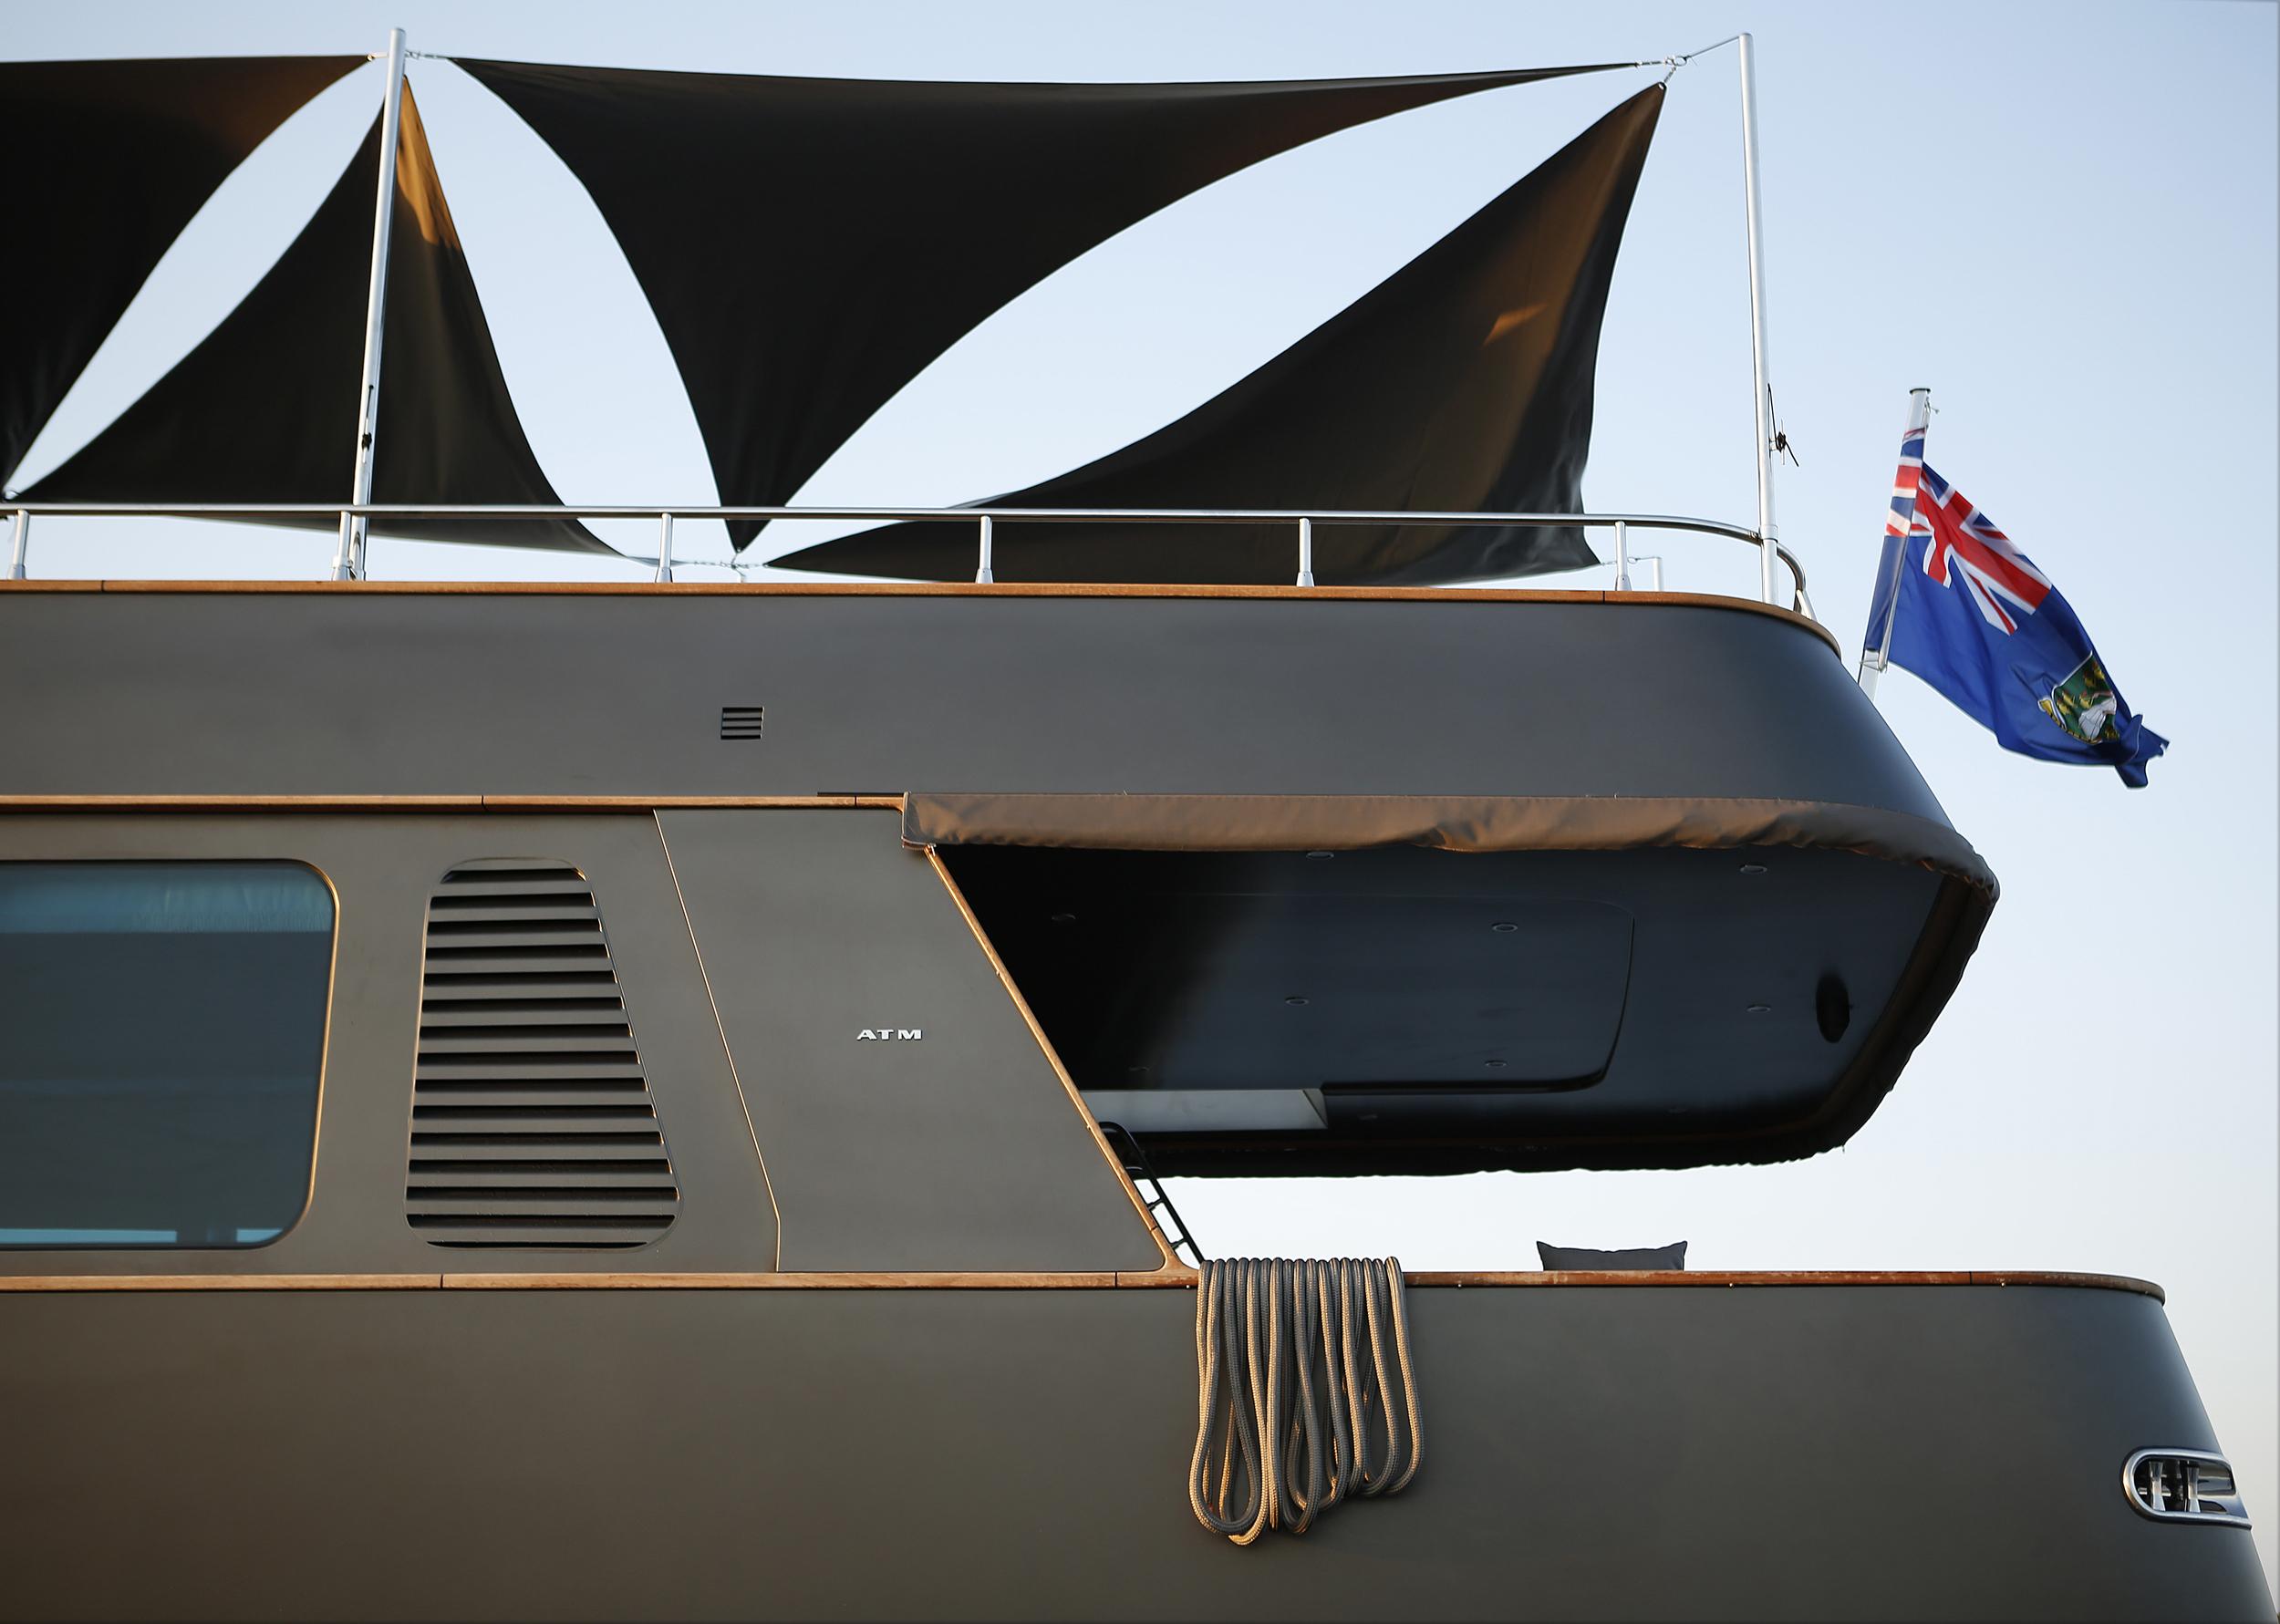 greystone-yacht-hero-shot.jpg